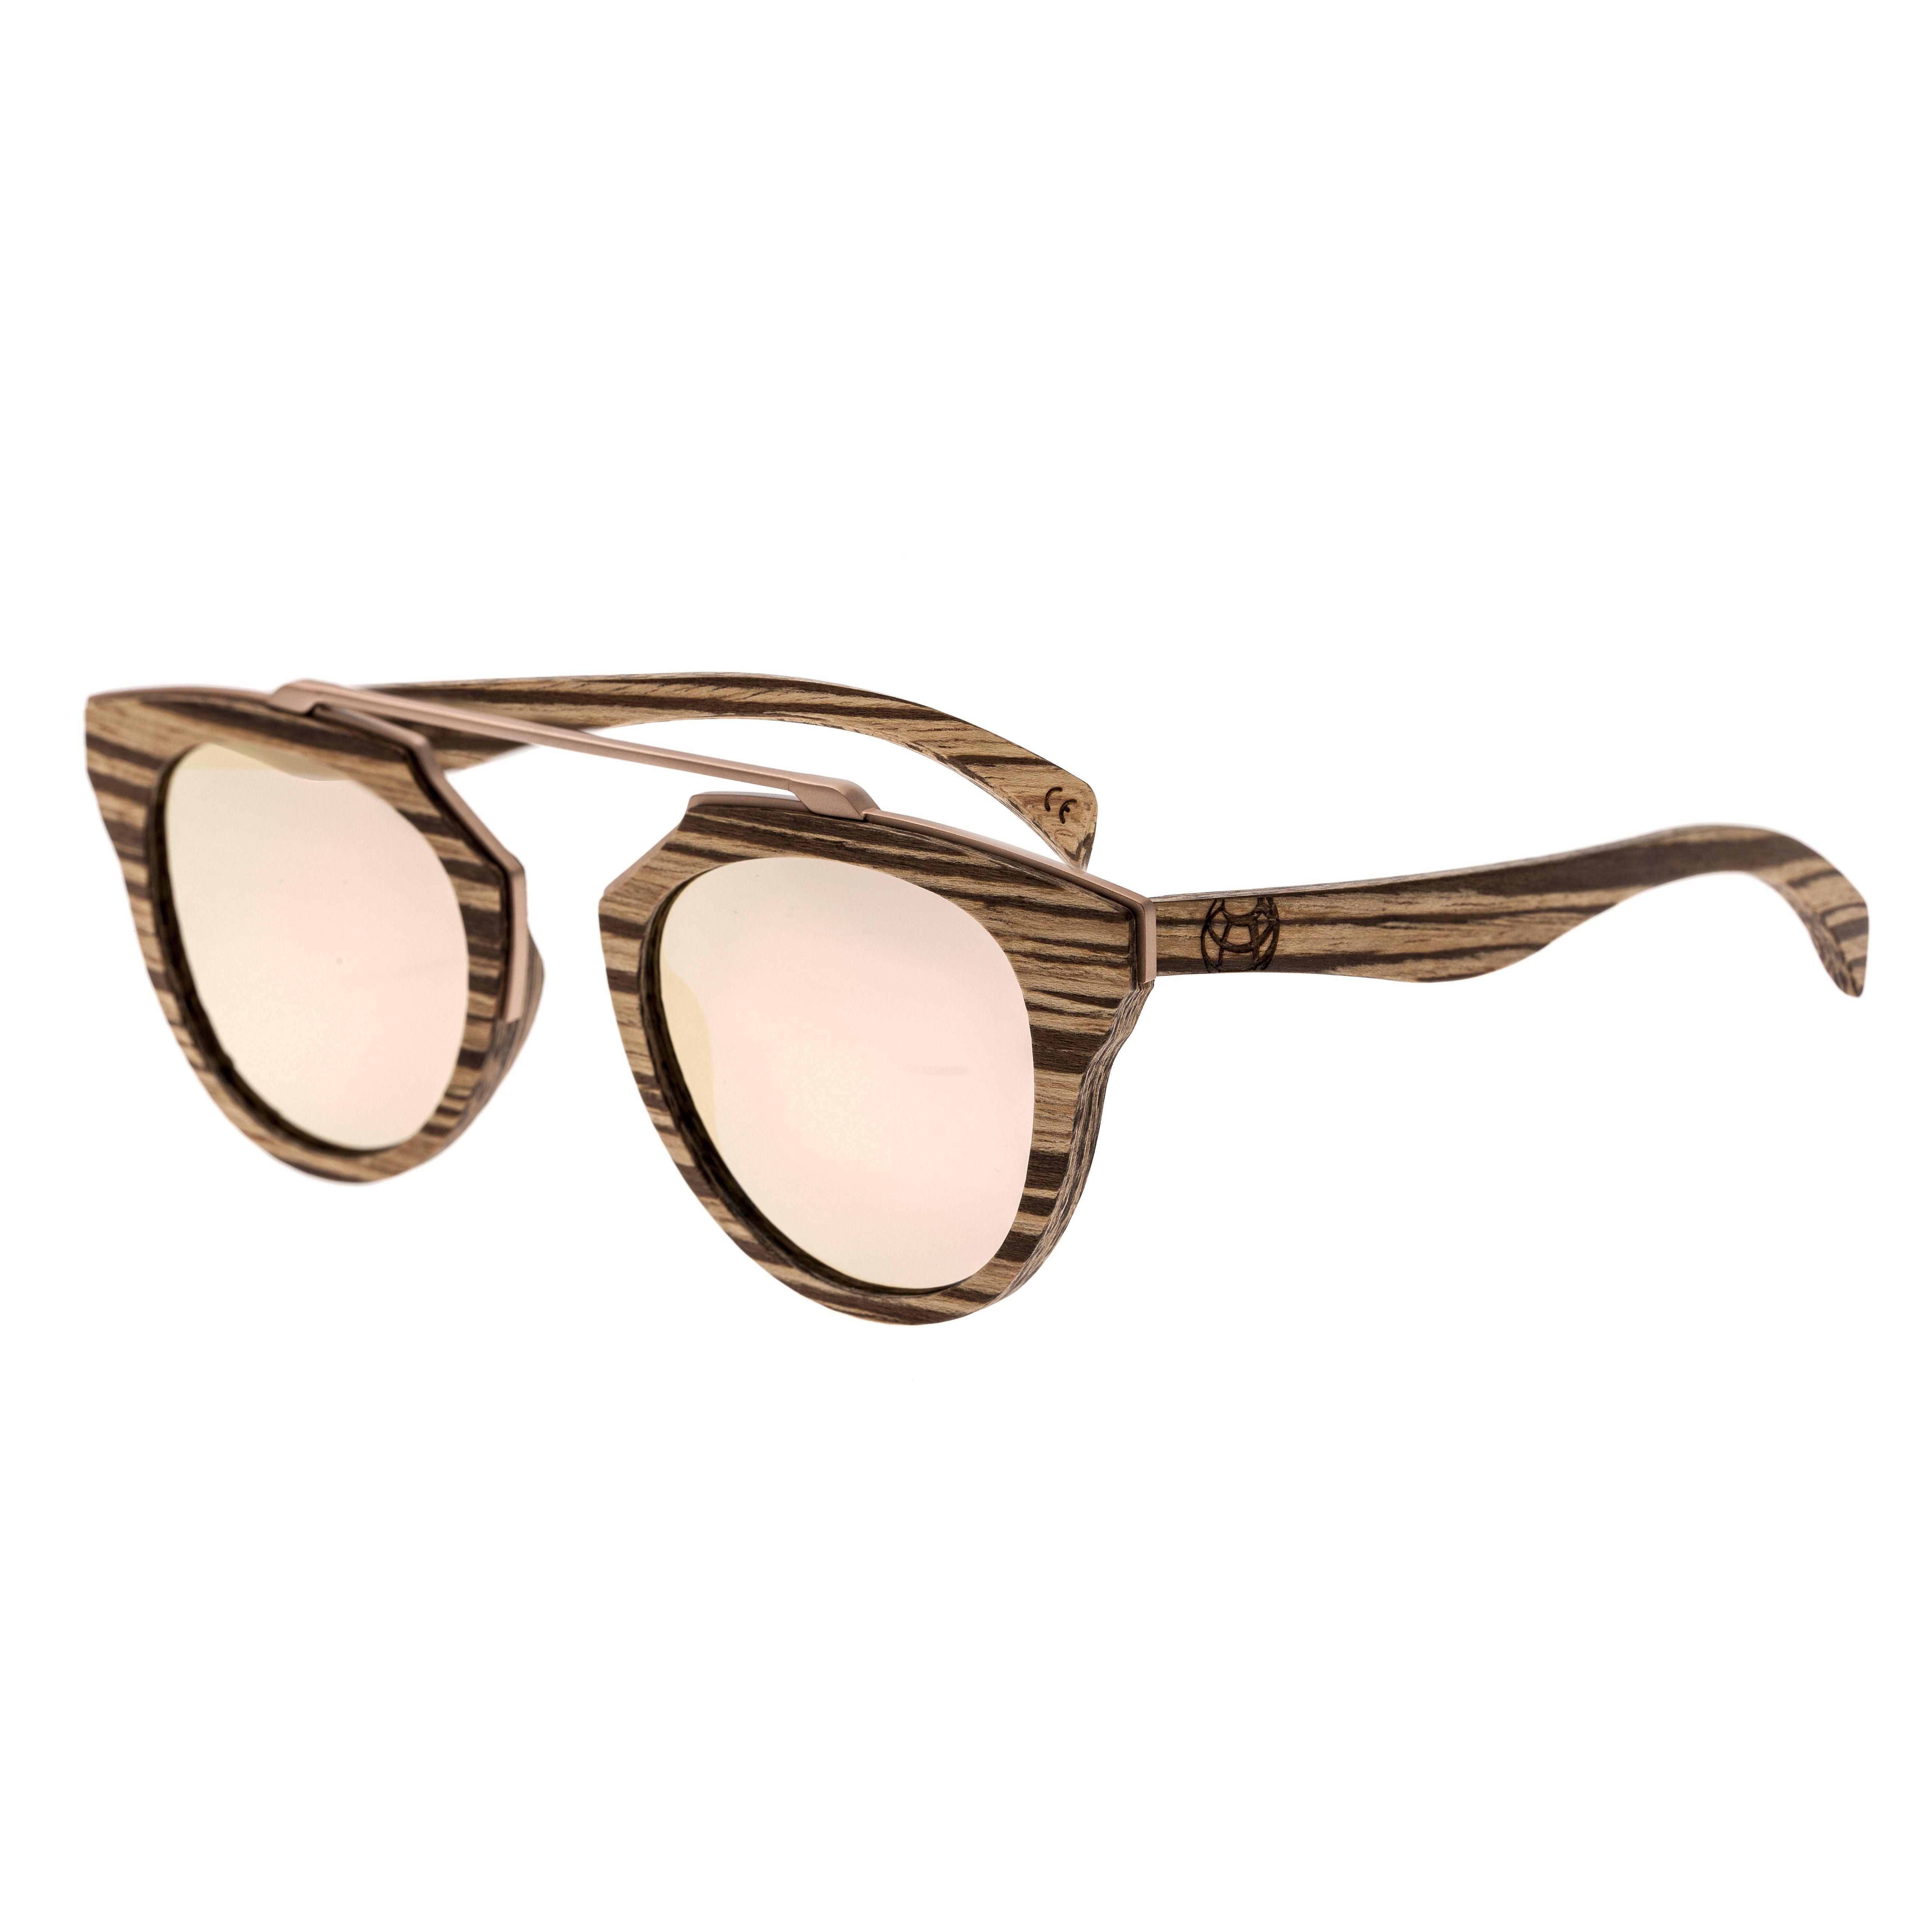 9538ddc487 Lyst - Earth Wood Ciera Sunglasses W  Polarized Lenses - Zebrawood ...